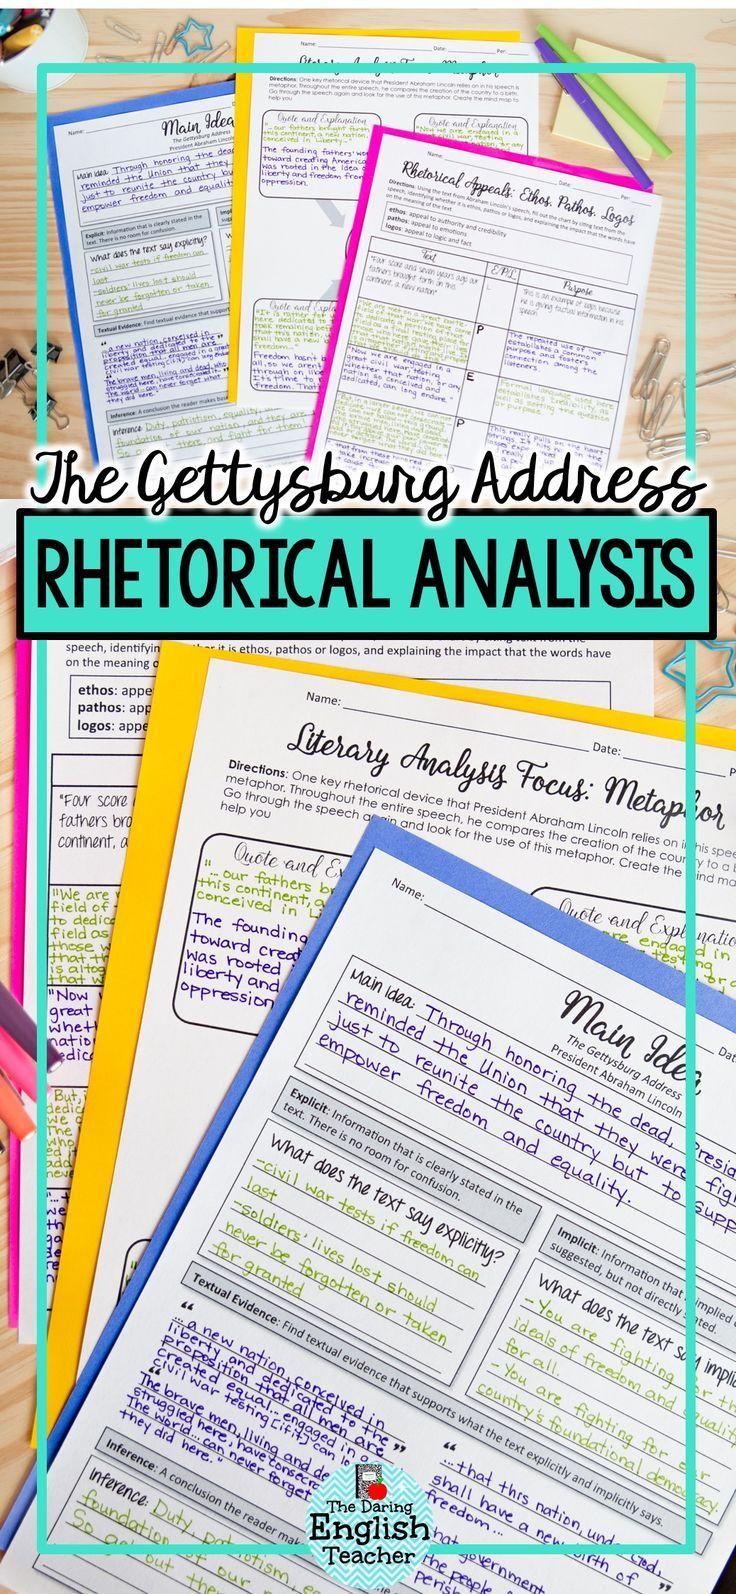 Teach Your Students Rhetorical Analysis With This Gettysburg Address Rhetorical Analysis Activity Unit That Inclu Rhetorical Analysis Rhetoric Writing Rubric